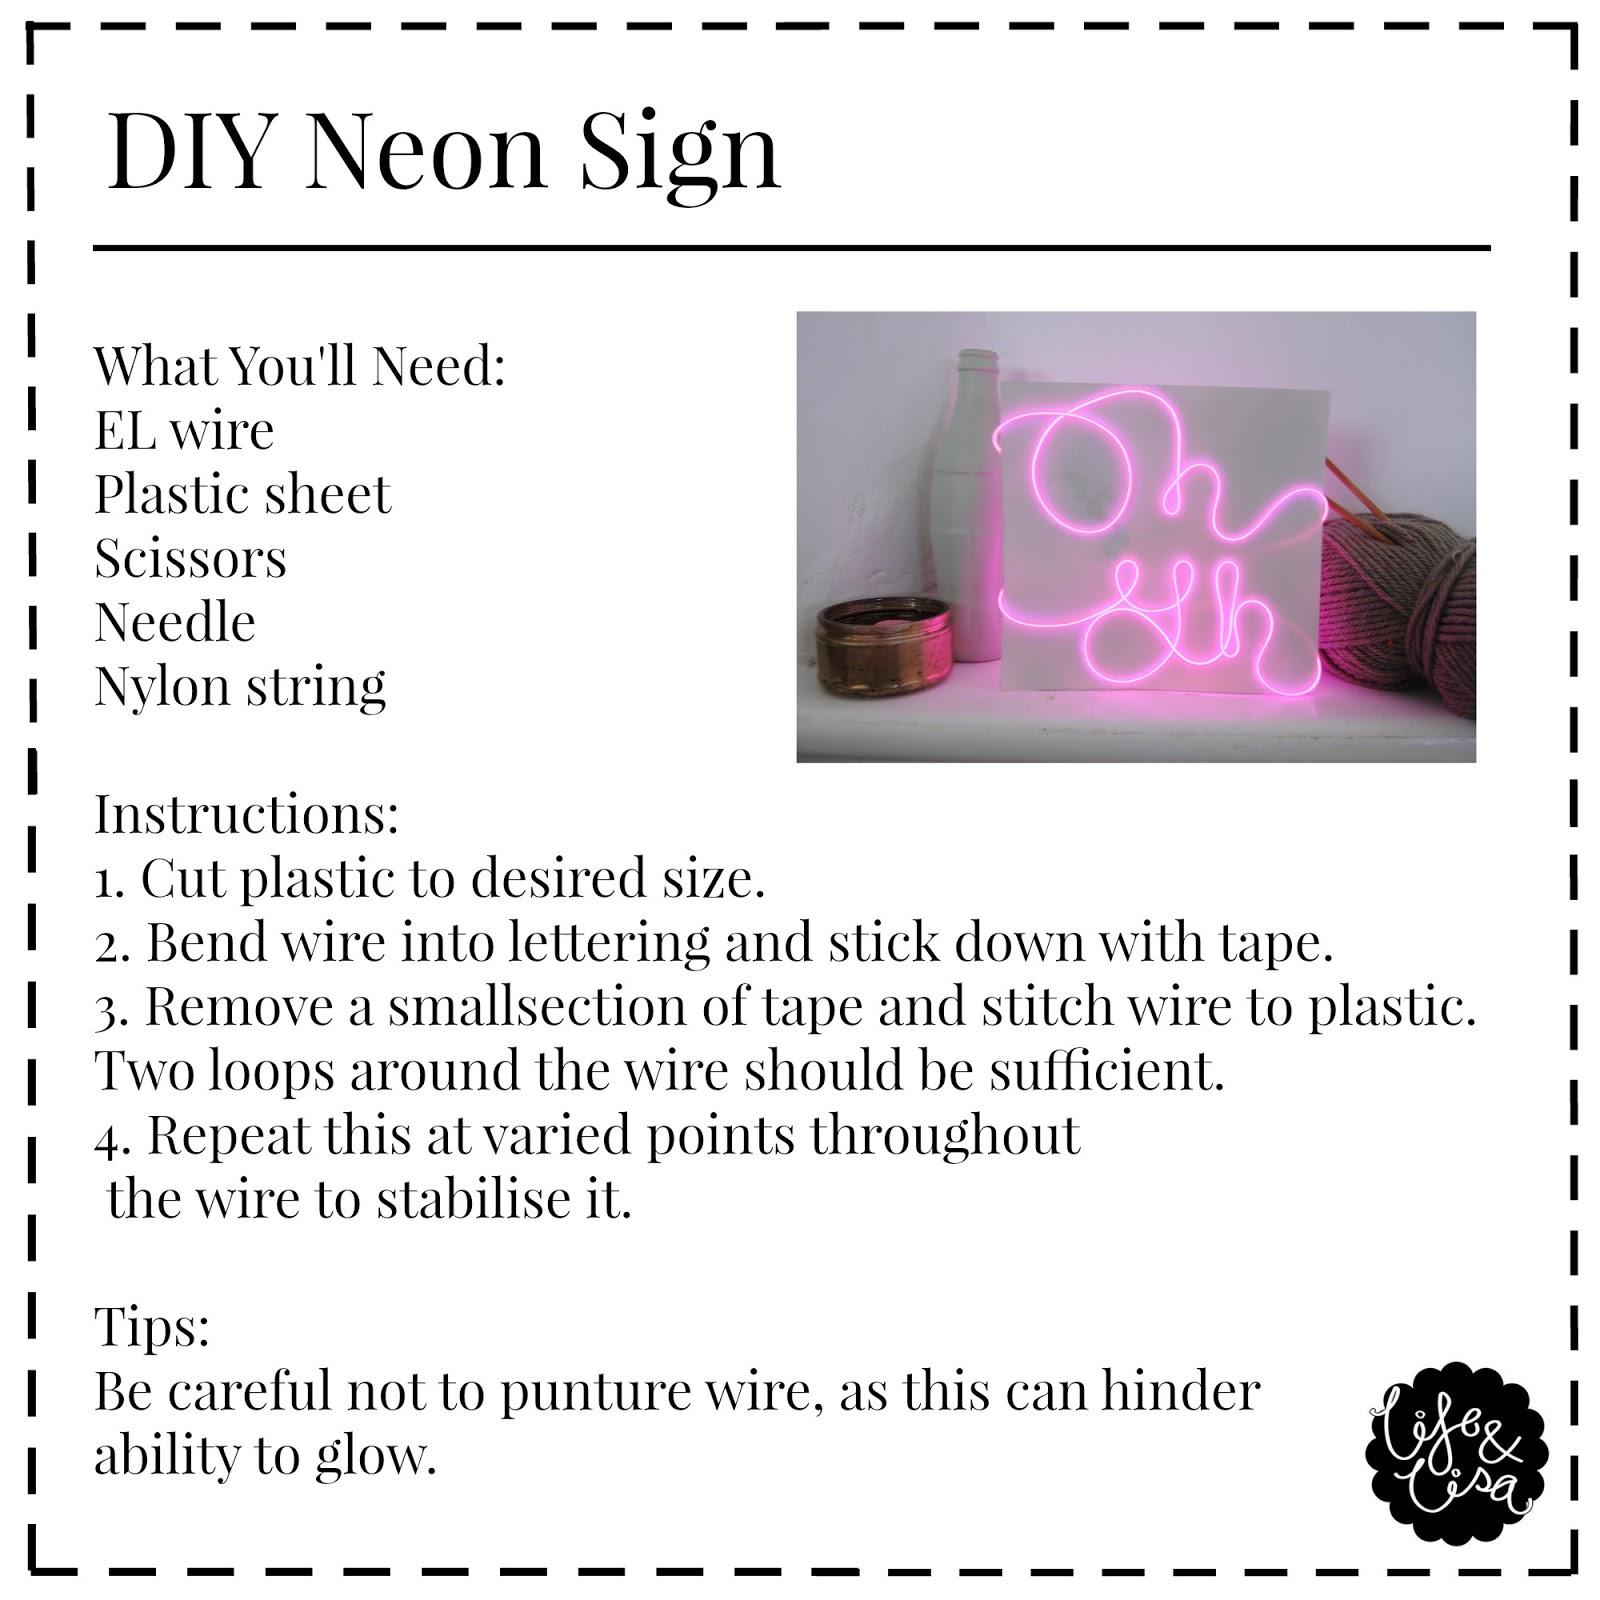 Life lisa diy neon sign monday 1 june 2015 solutioingenieria Choice Image